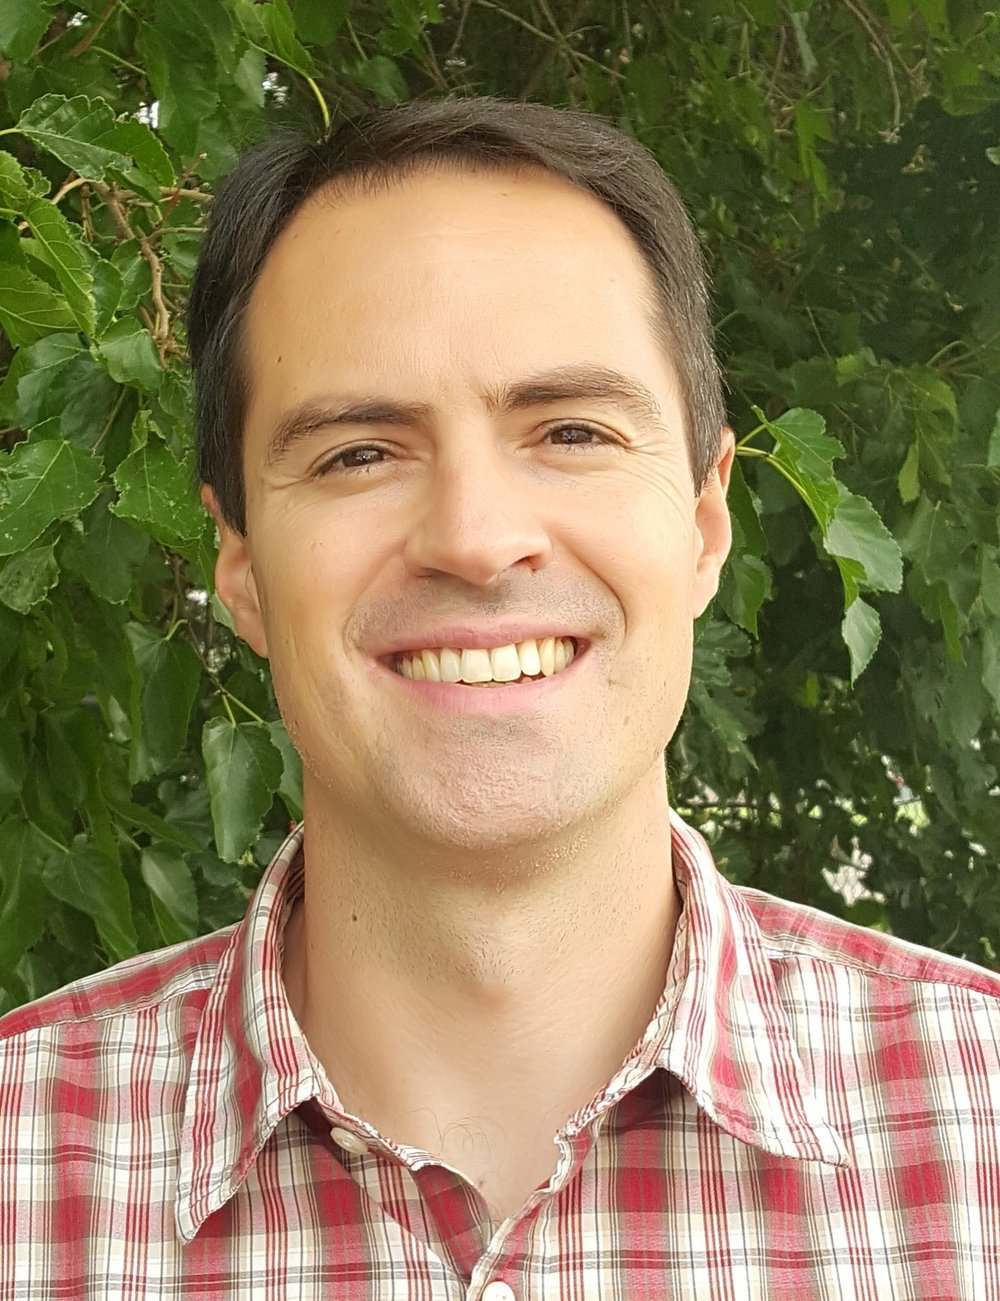 Todd Coffey PhD Chair & Associate Professor - Dept. of Research and Biostatistics Tel: (208) 810-7814 tcoffey@idahocom.org